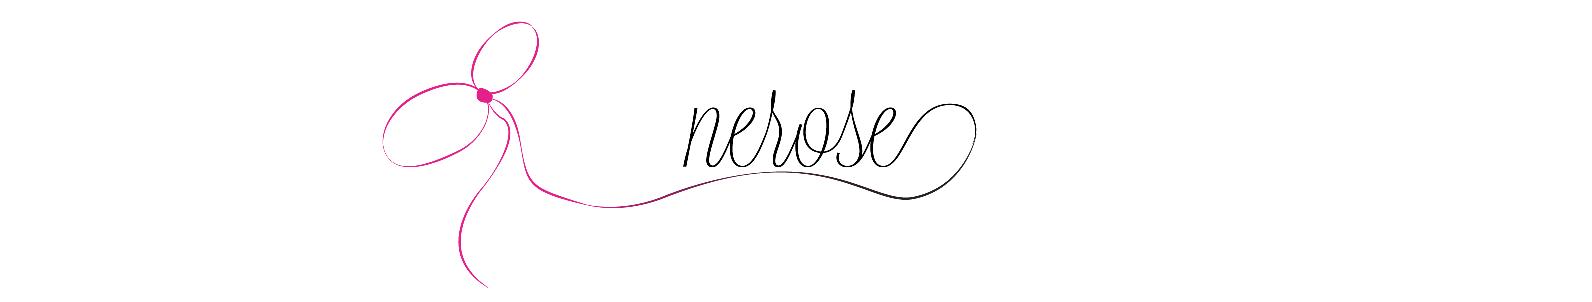 NEROSE Blog